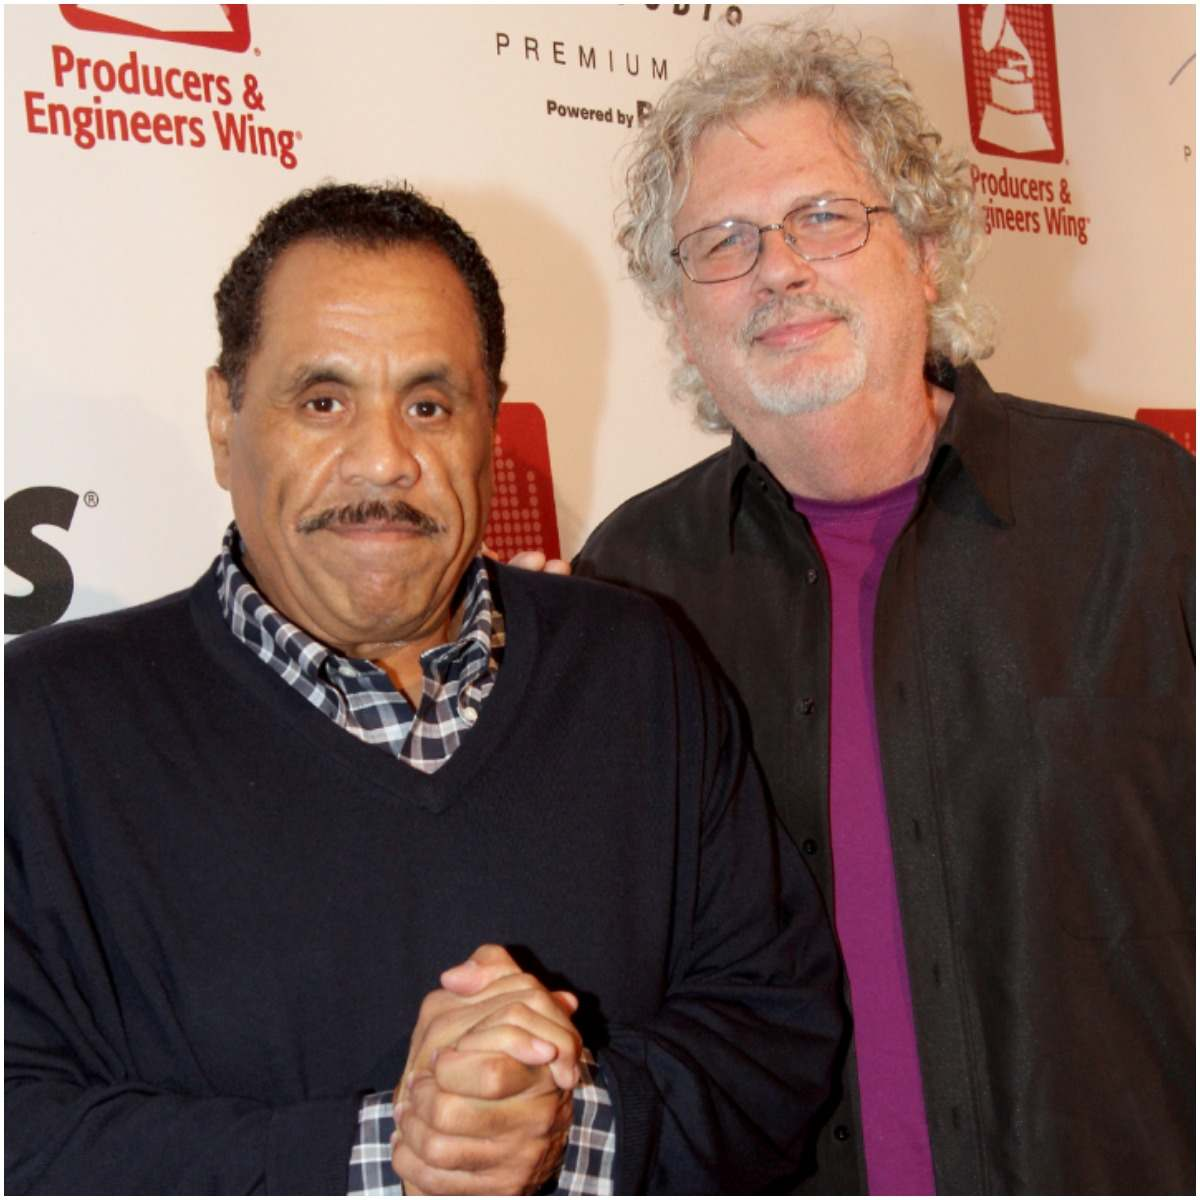 Dave Pensado with Herb Trawick